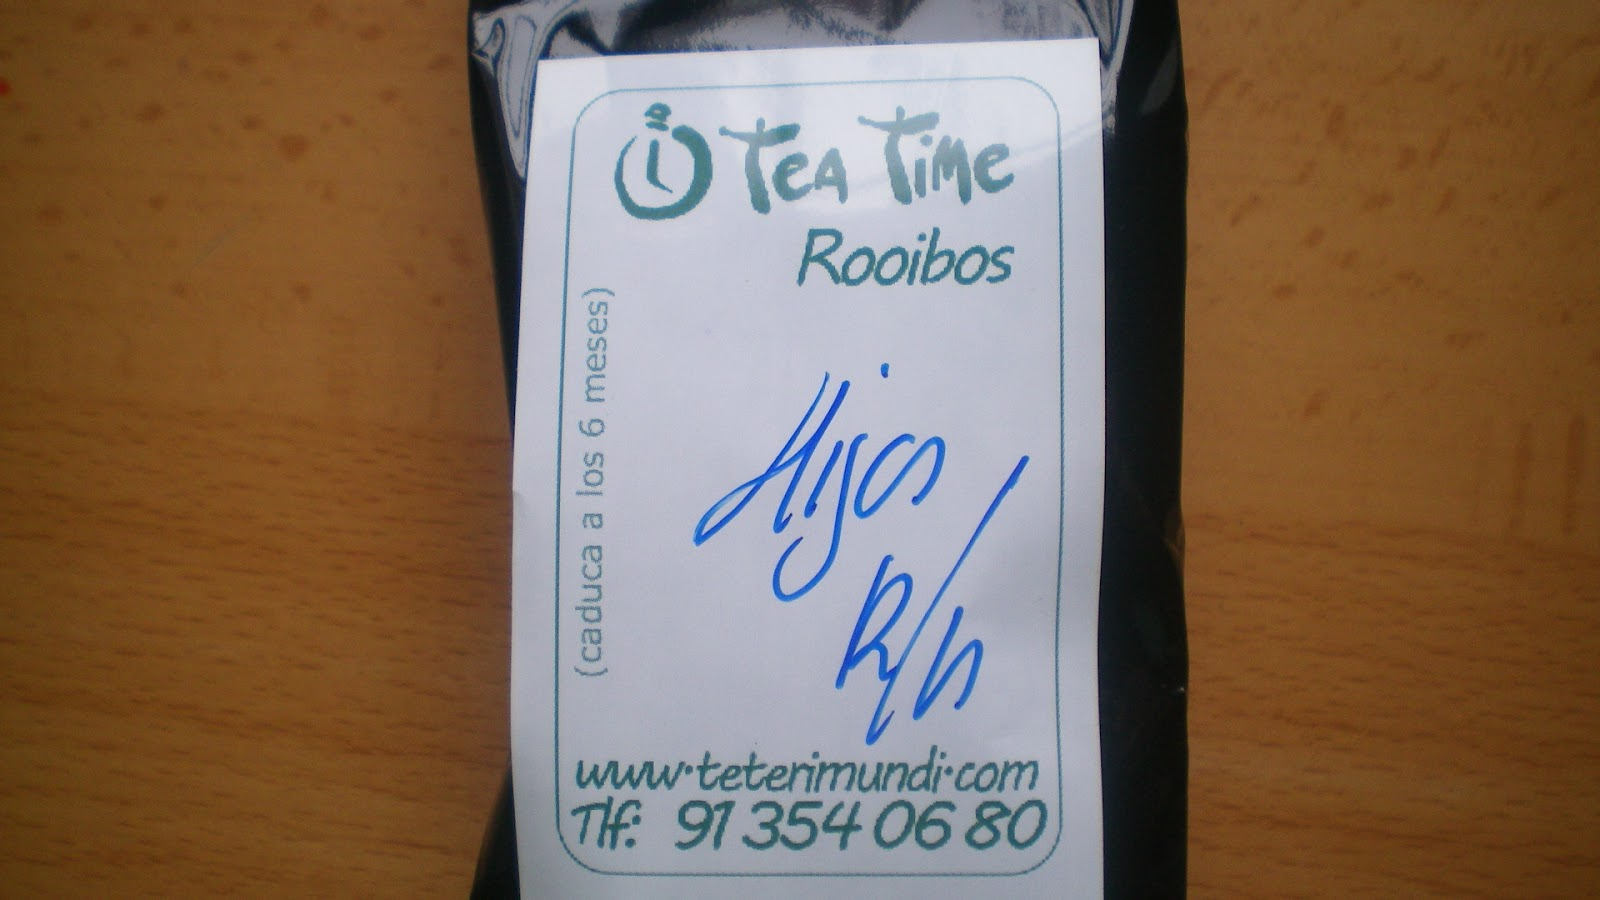 rooibos-higos-teterimundi